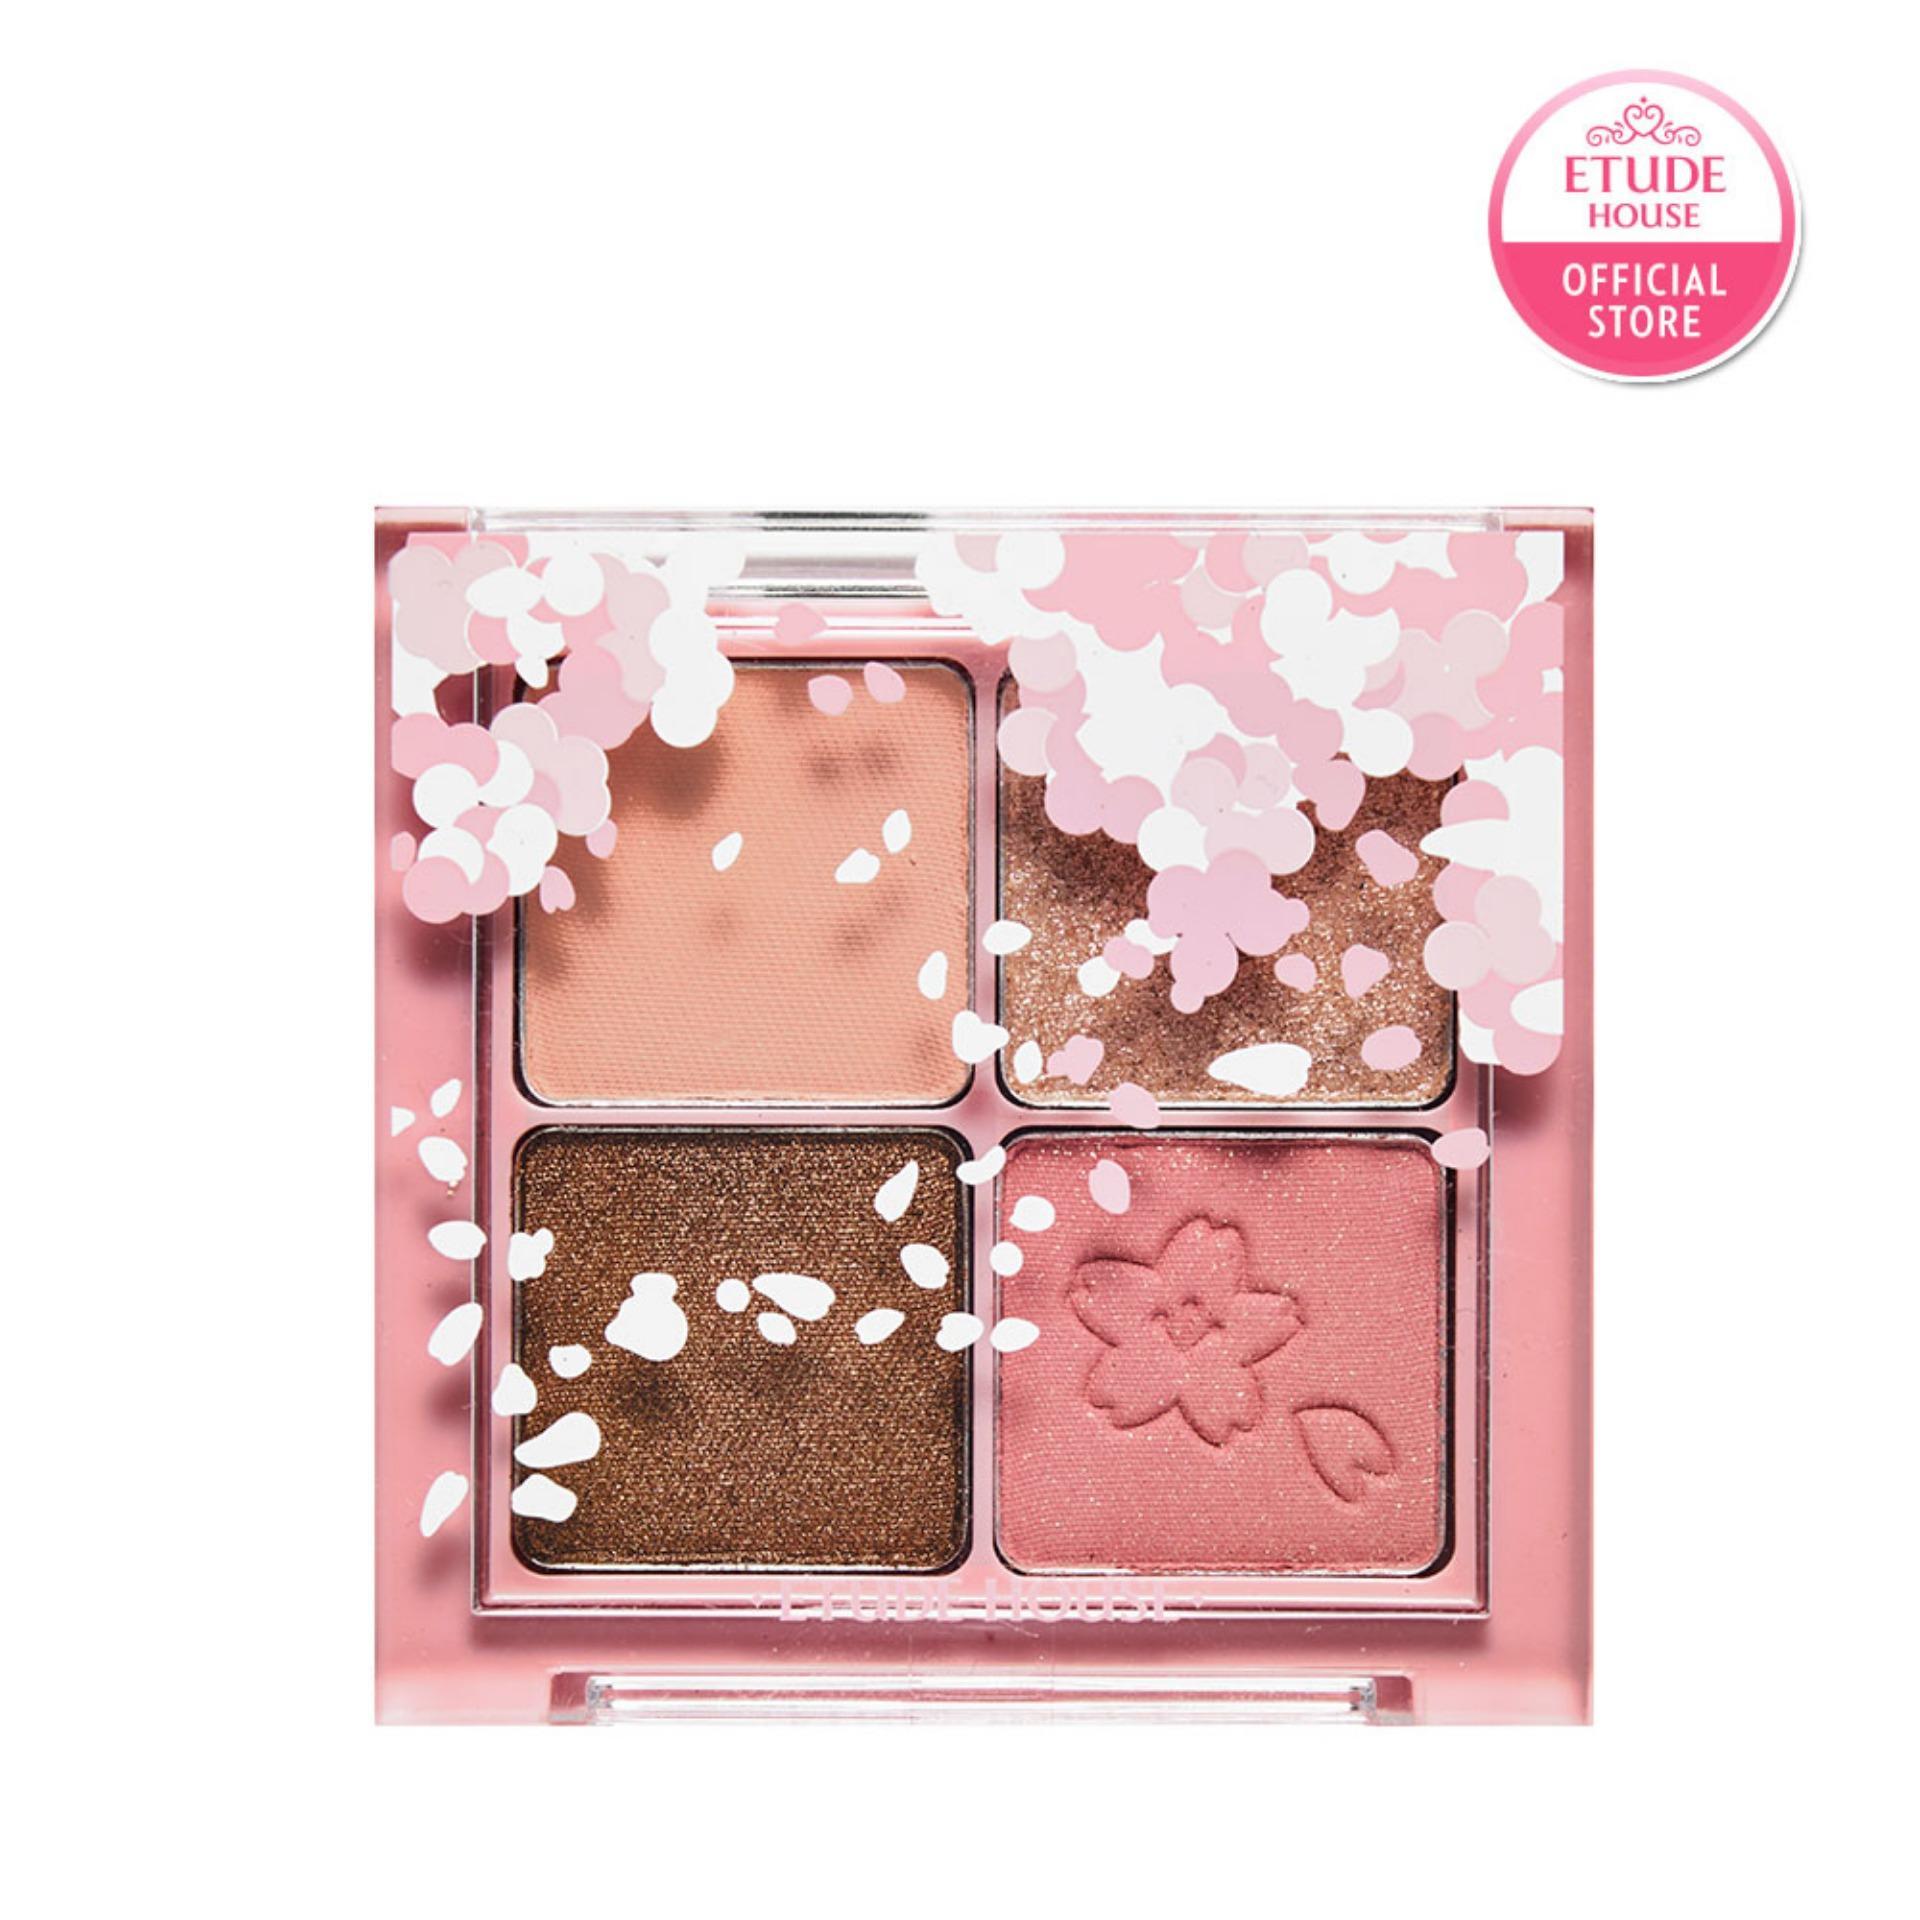 Etude House Cherry Blossom Blend For Eyes 1 Reviews